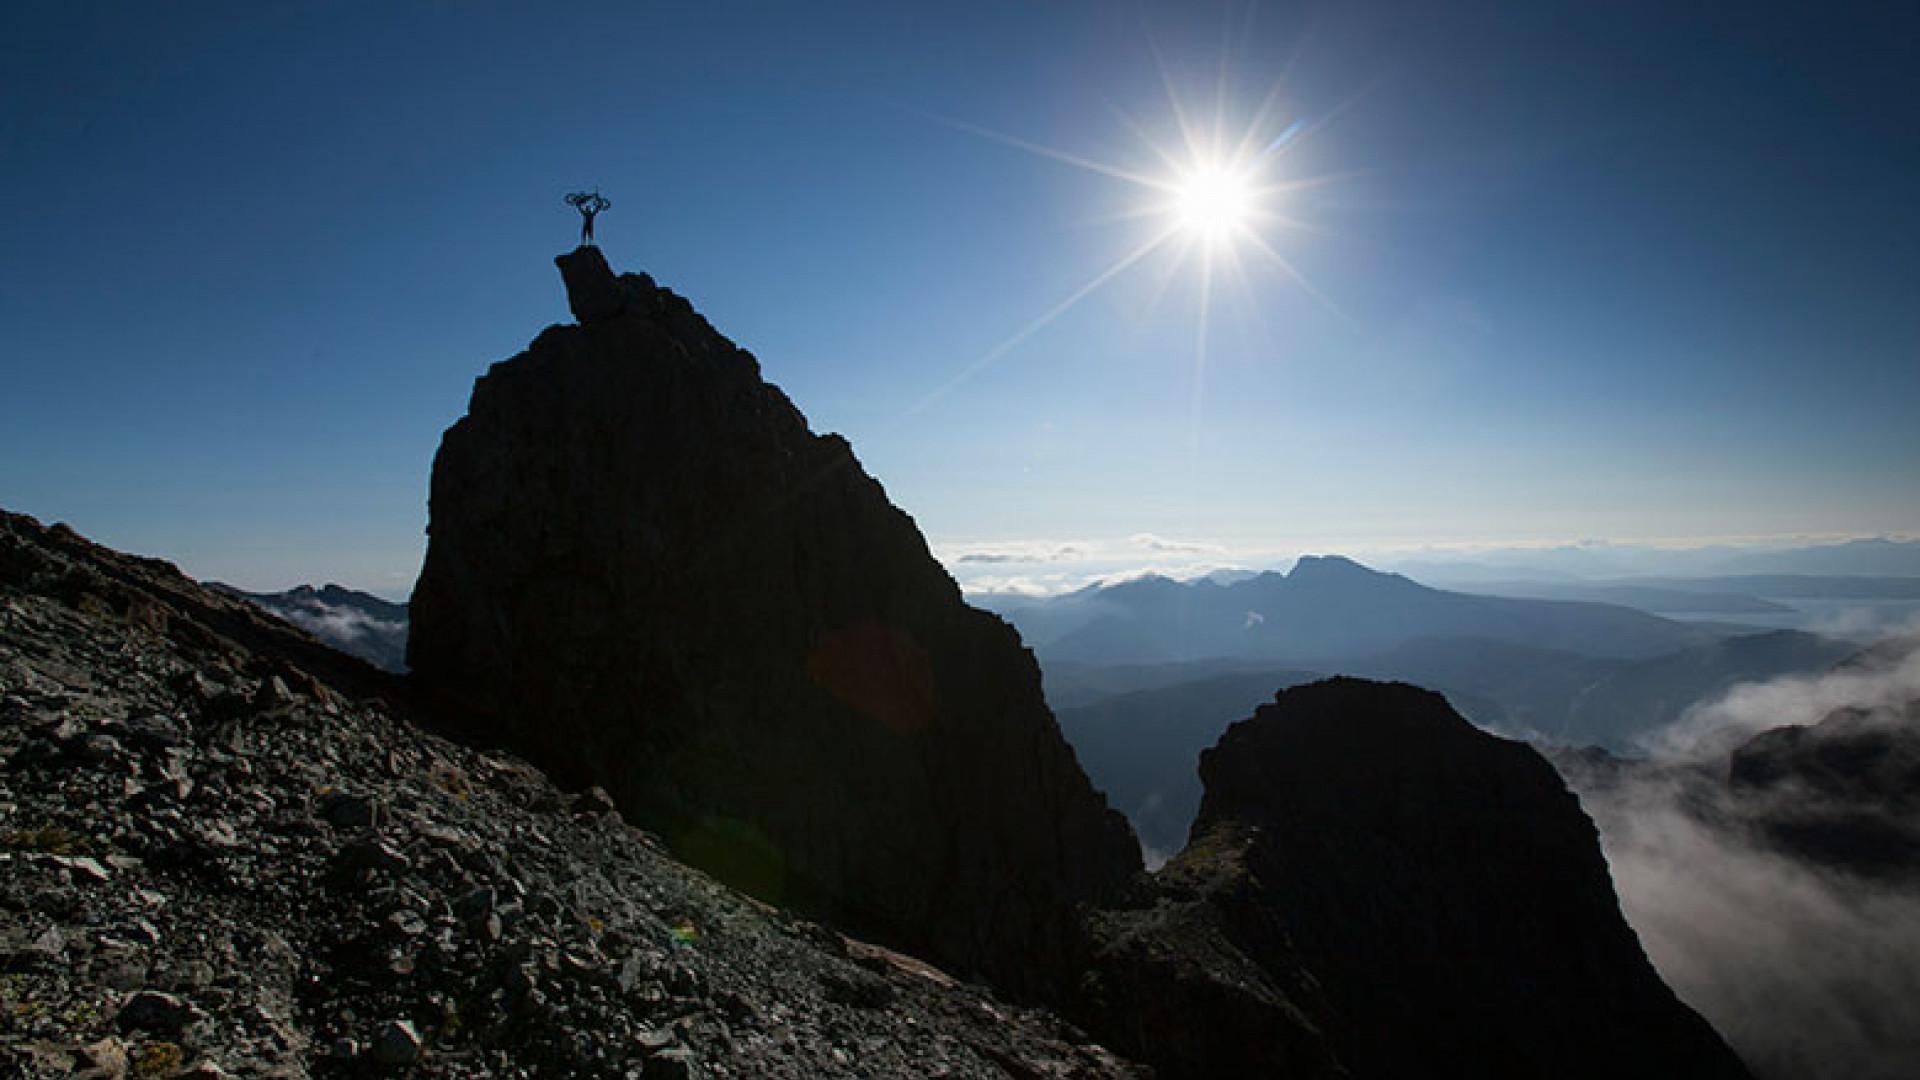 Danny-MacAskill-The-Ridge-2